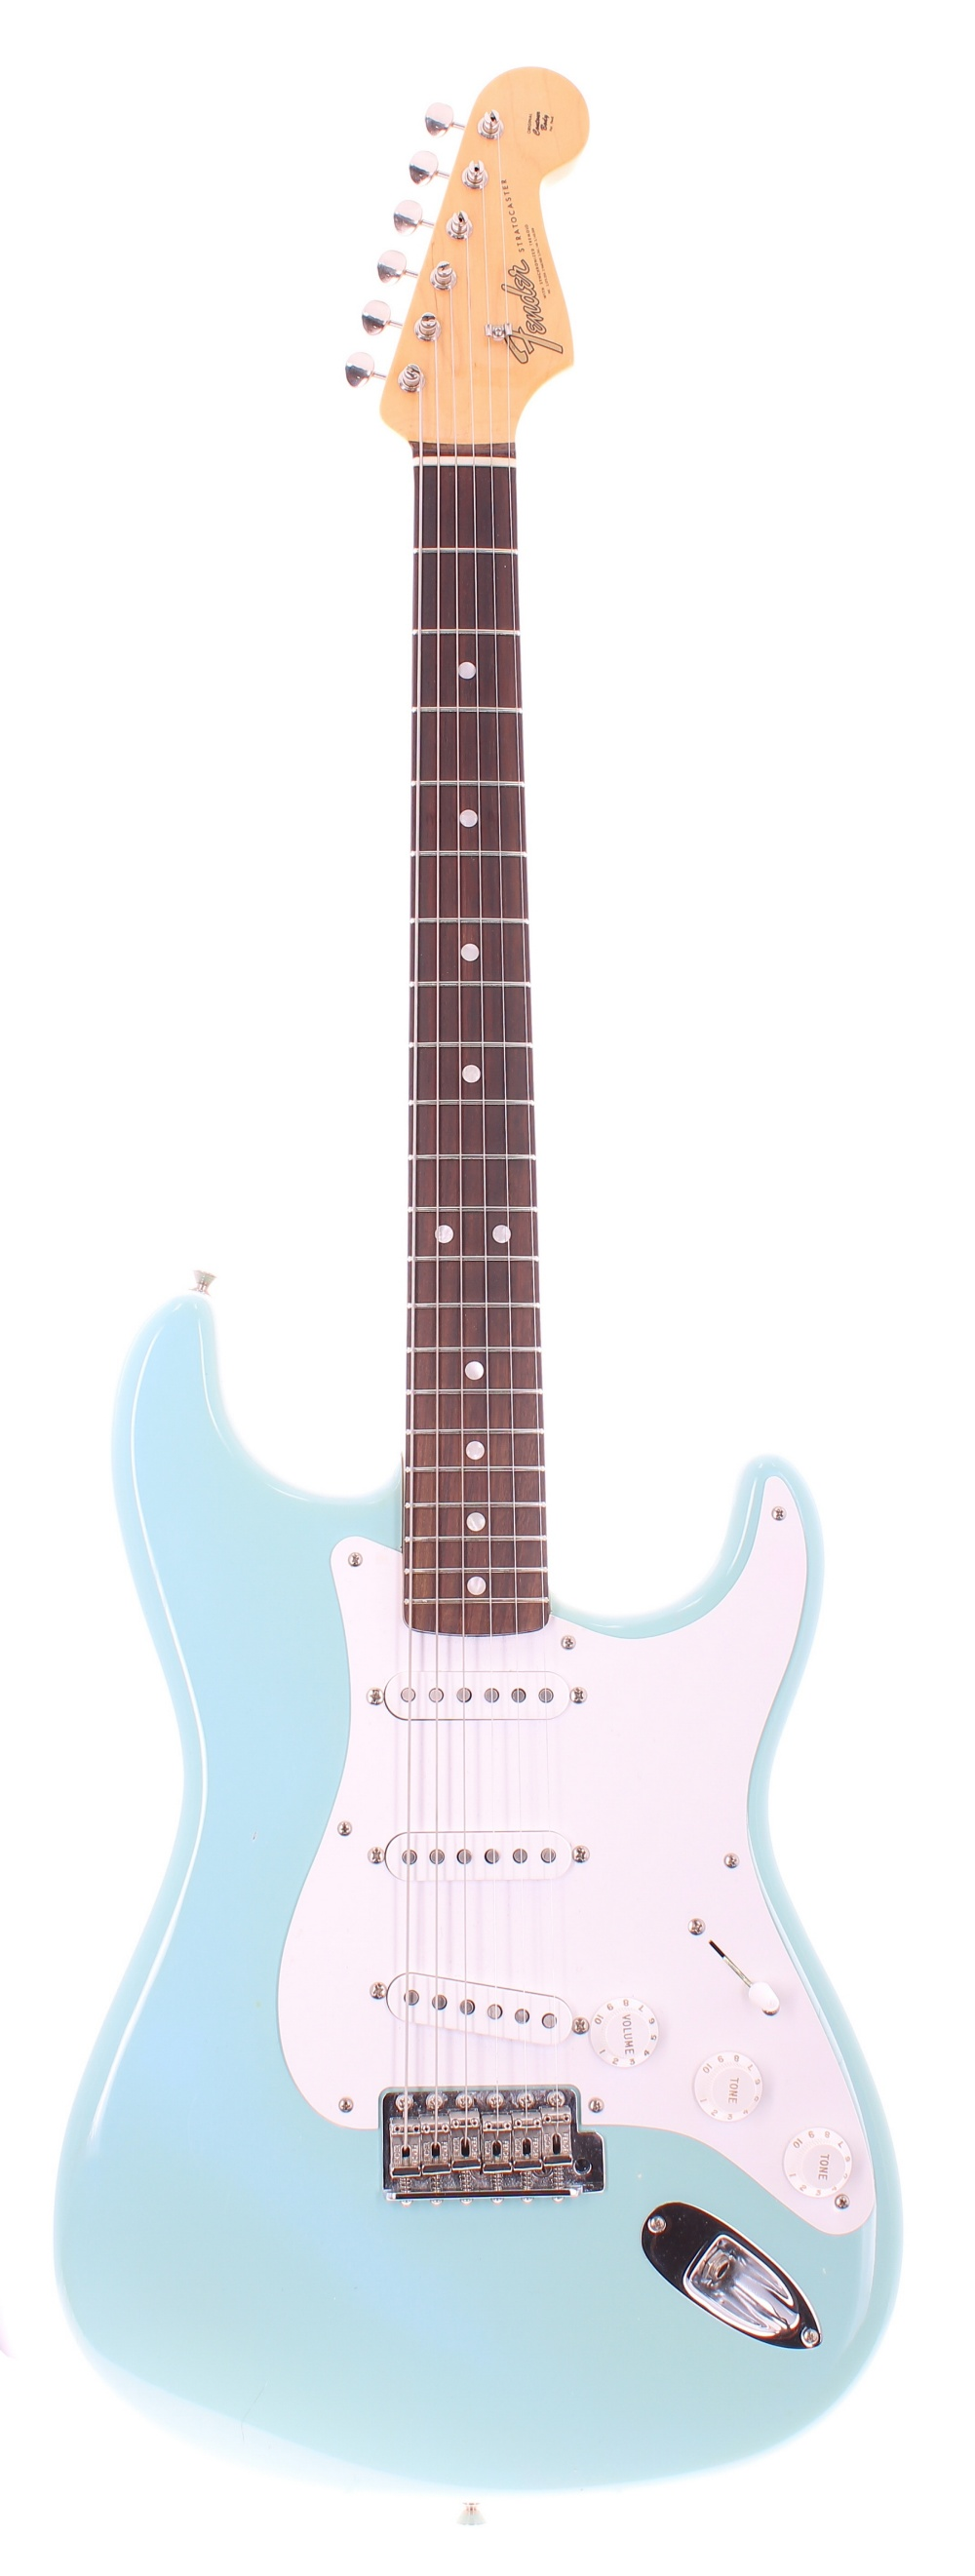 Fender Custom Shop '56 Stratocaster NOS electric guitar, with 2019 Genuine Fender Parts